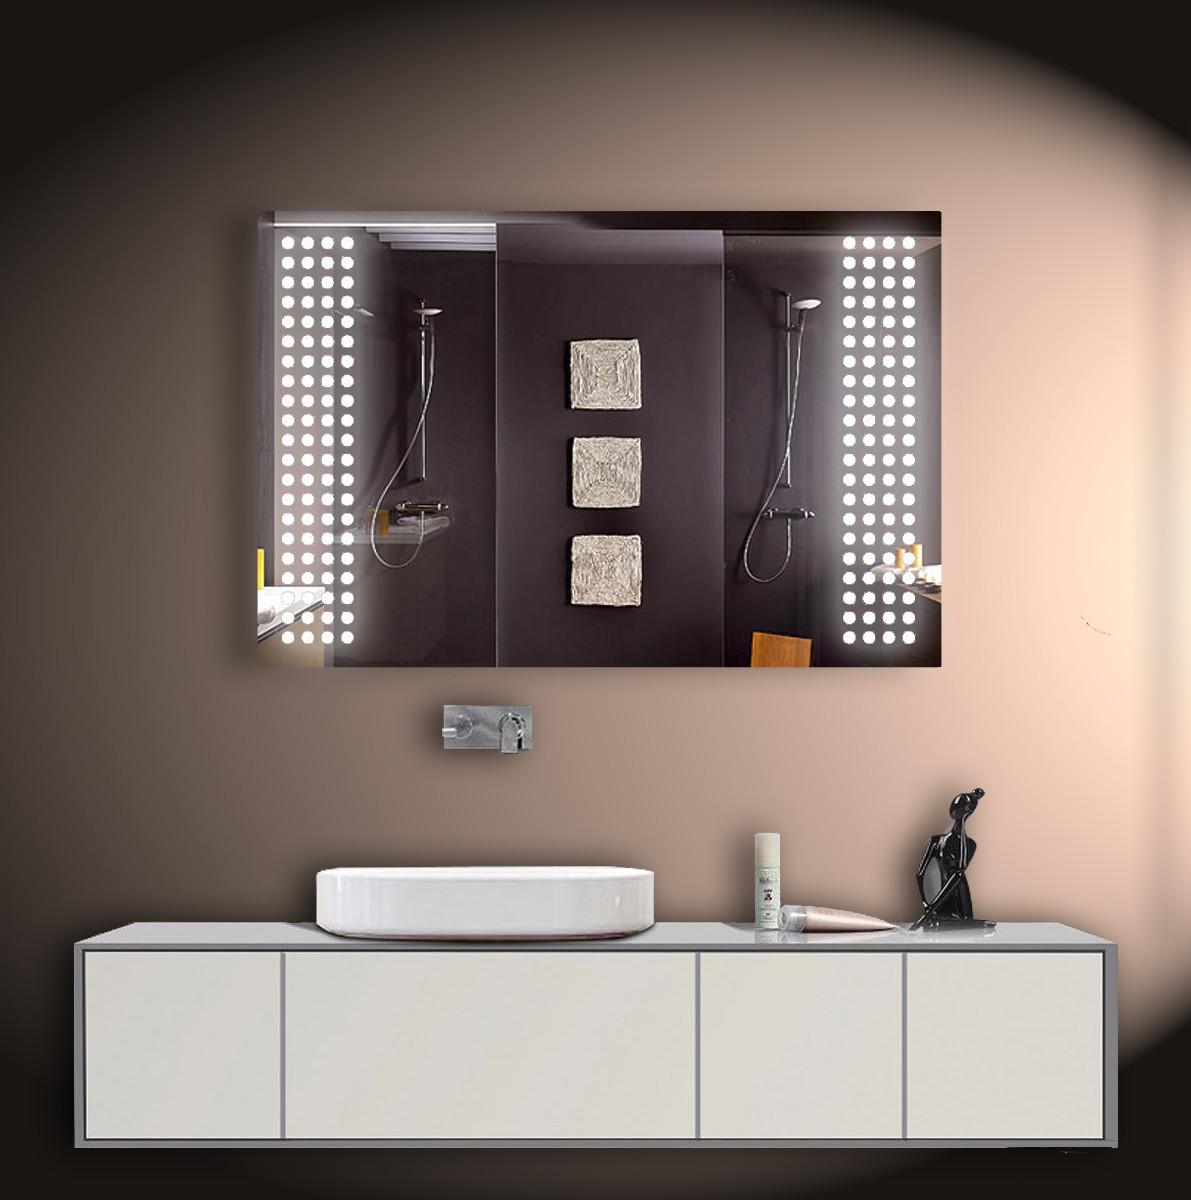 Зеркало LED со светодиодной подсветкой ver-3094 1200х800 мм